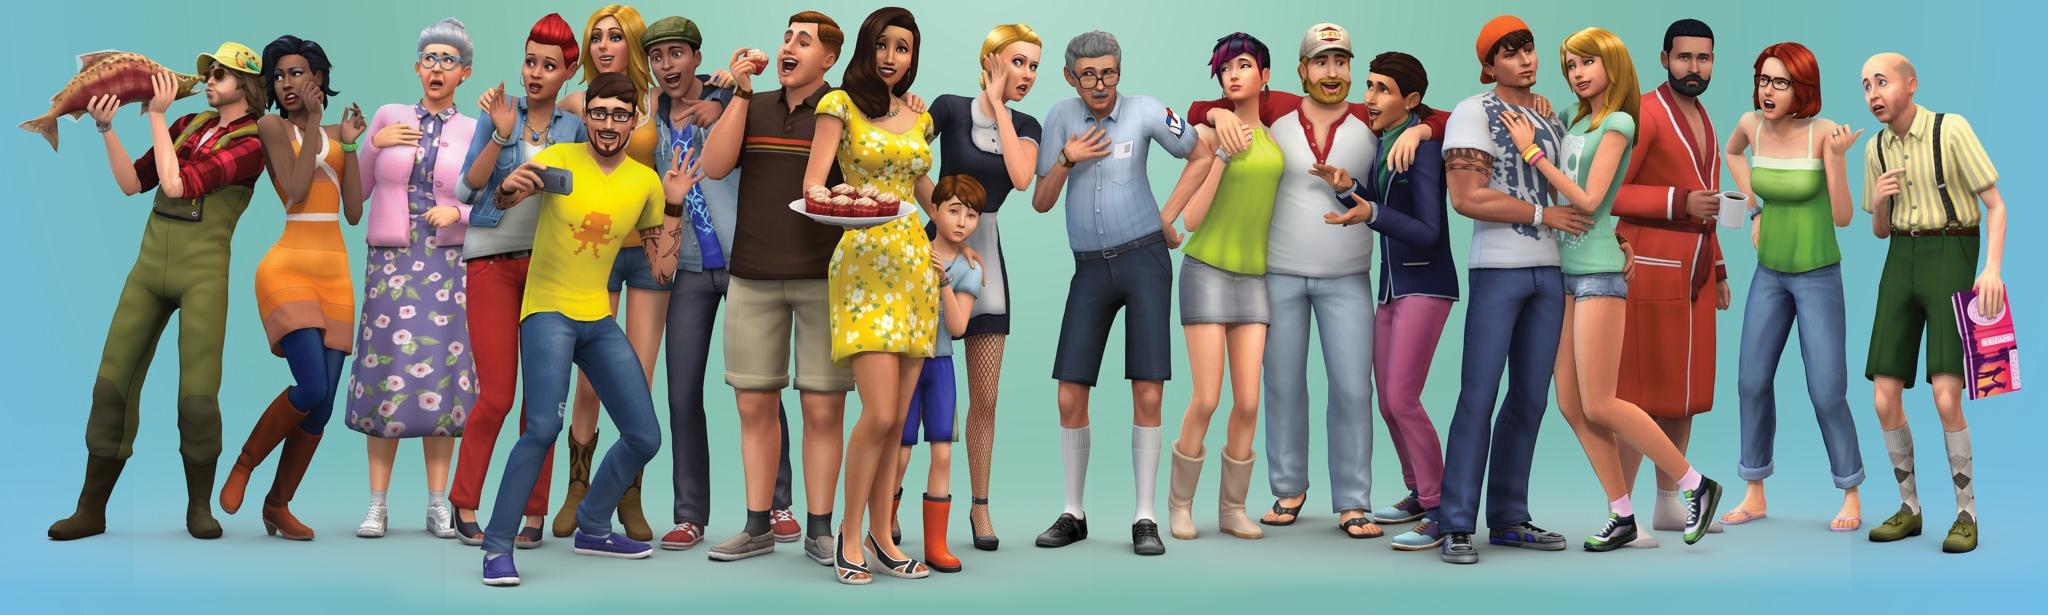 Sims 3 какой сегодня курс - 3